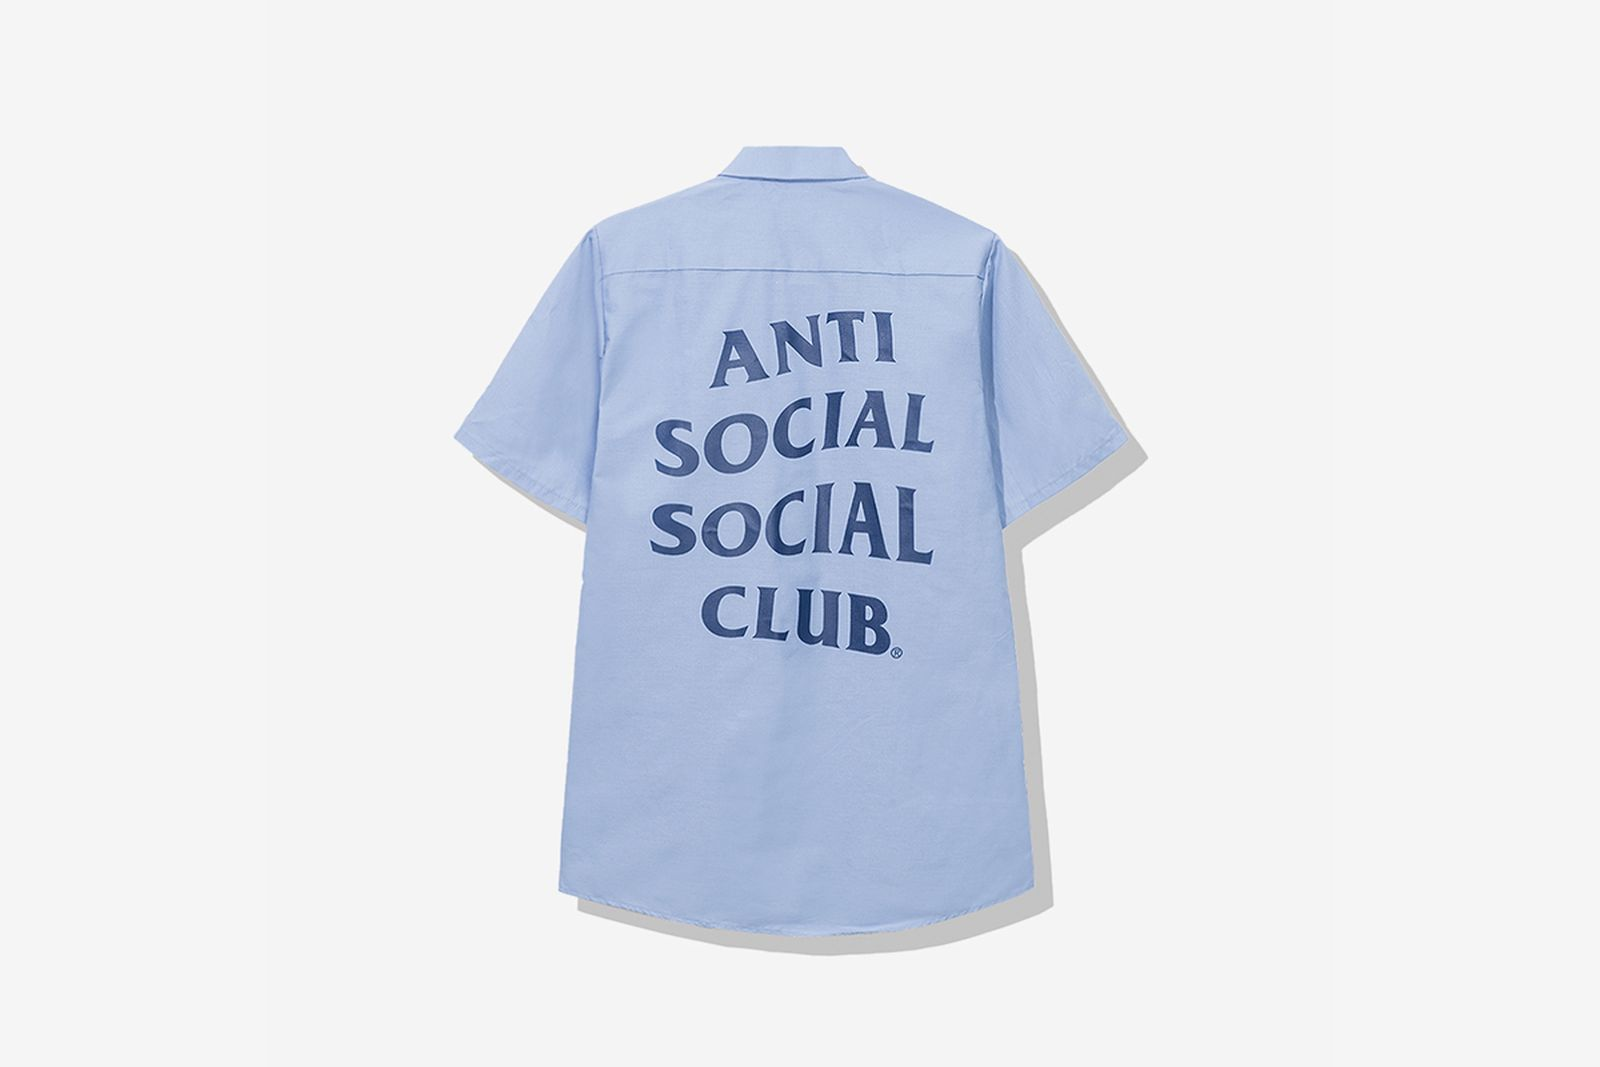 anti-social-social-club-usps-collaboration-2-06